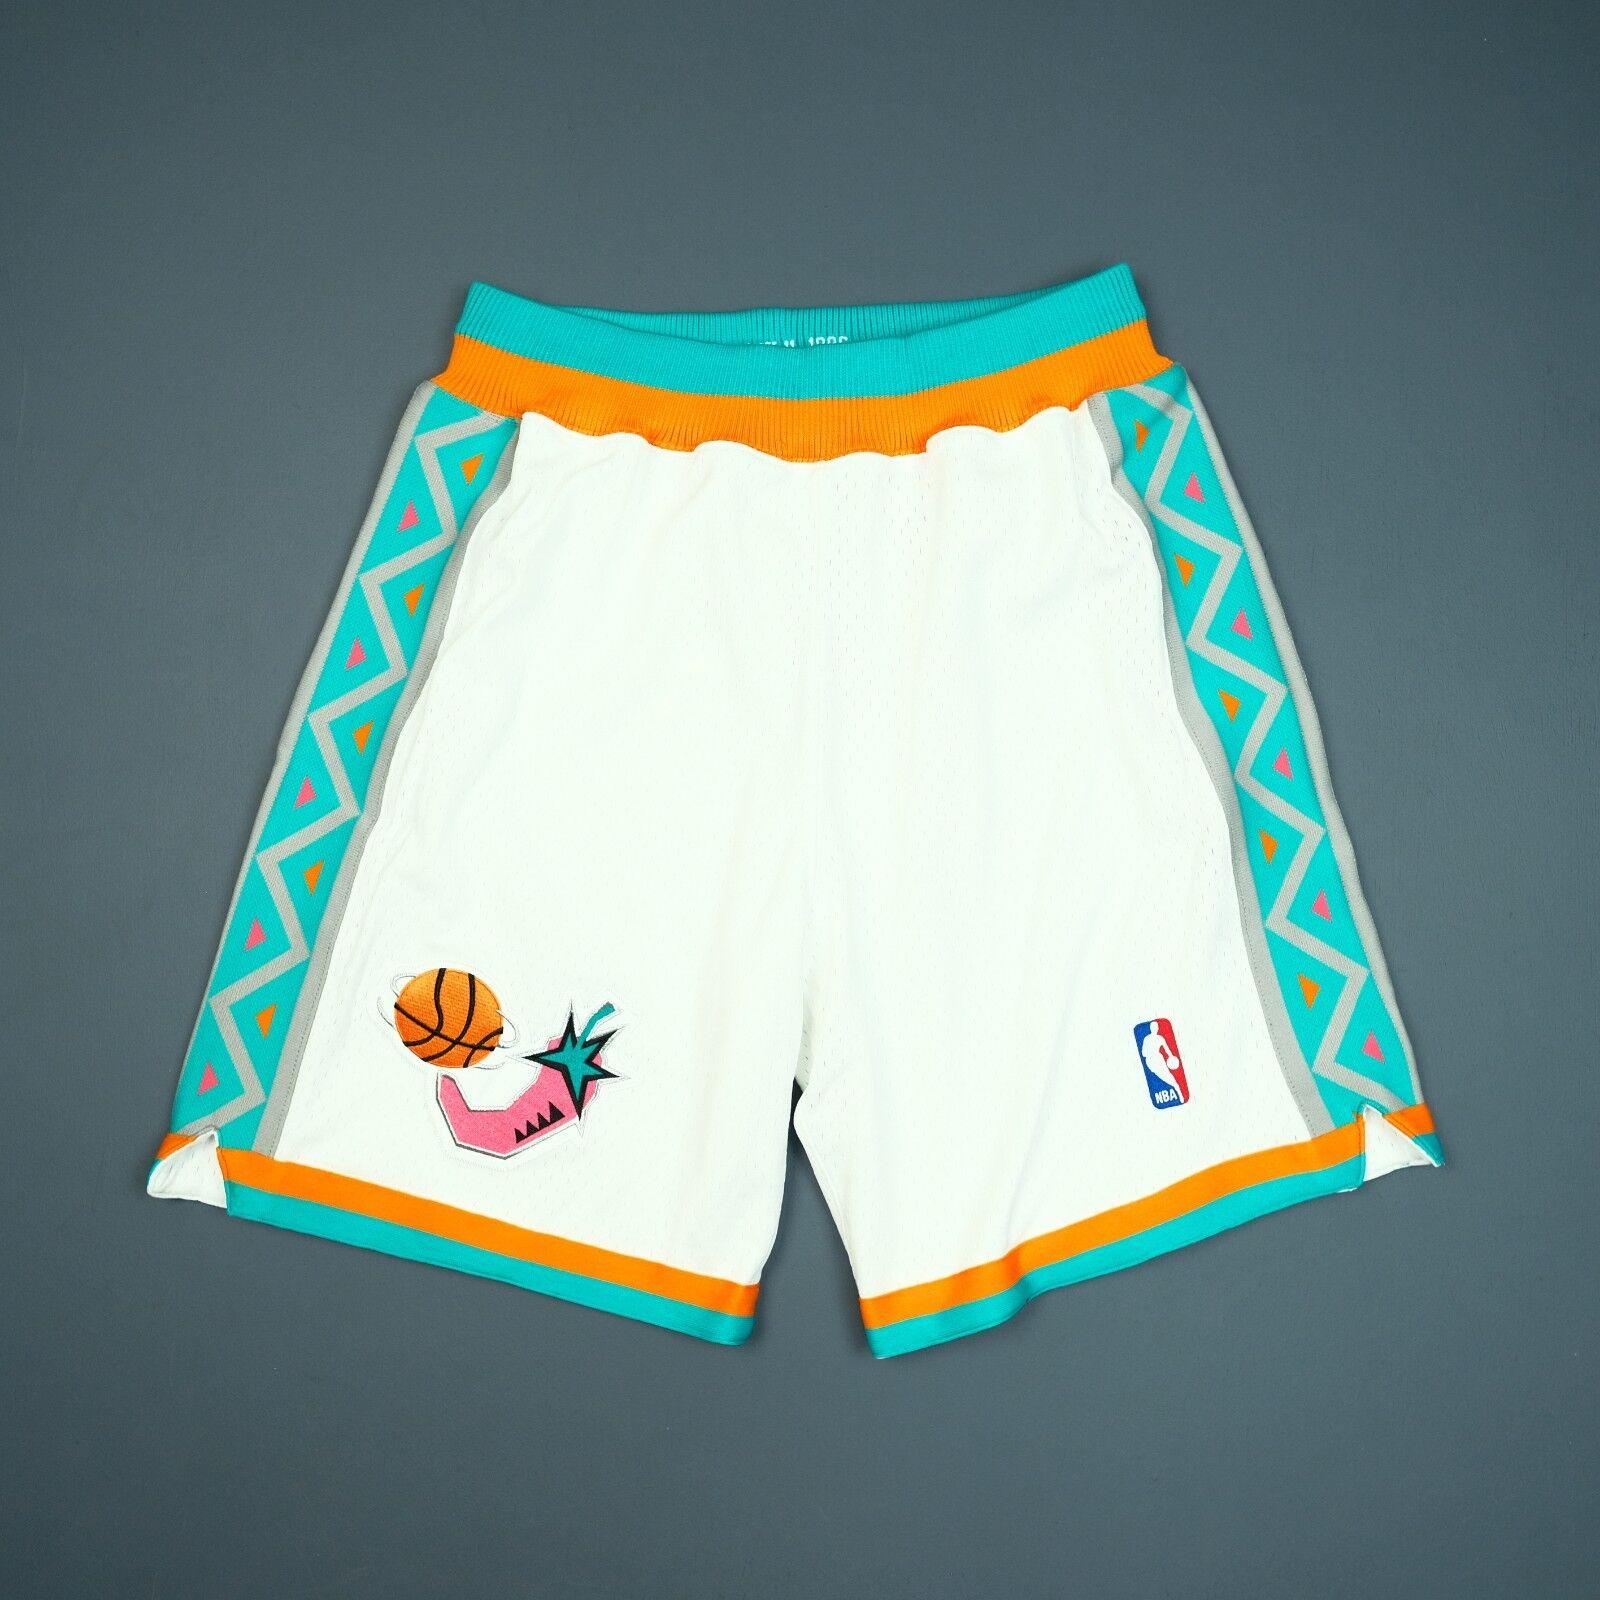 100% Authentisch Authentisch Authentisch Mitchell & Ness 1996 All Star Spiel NBA Shorts Herren GRÖSSE L 53cd24